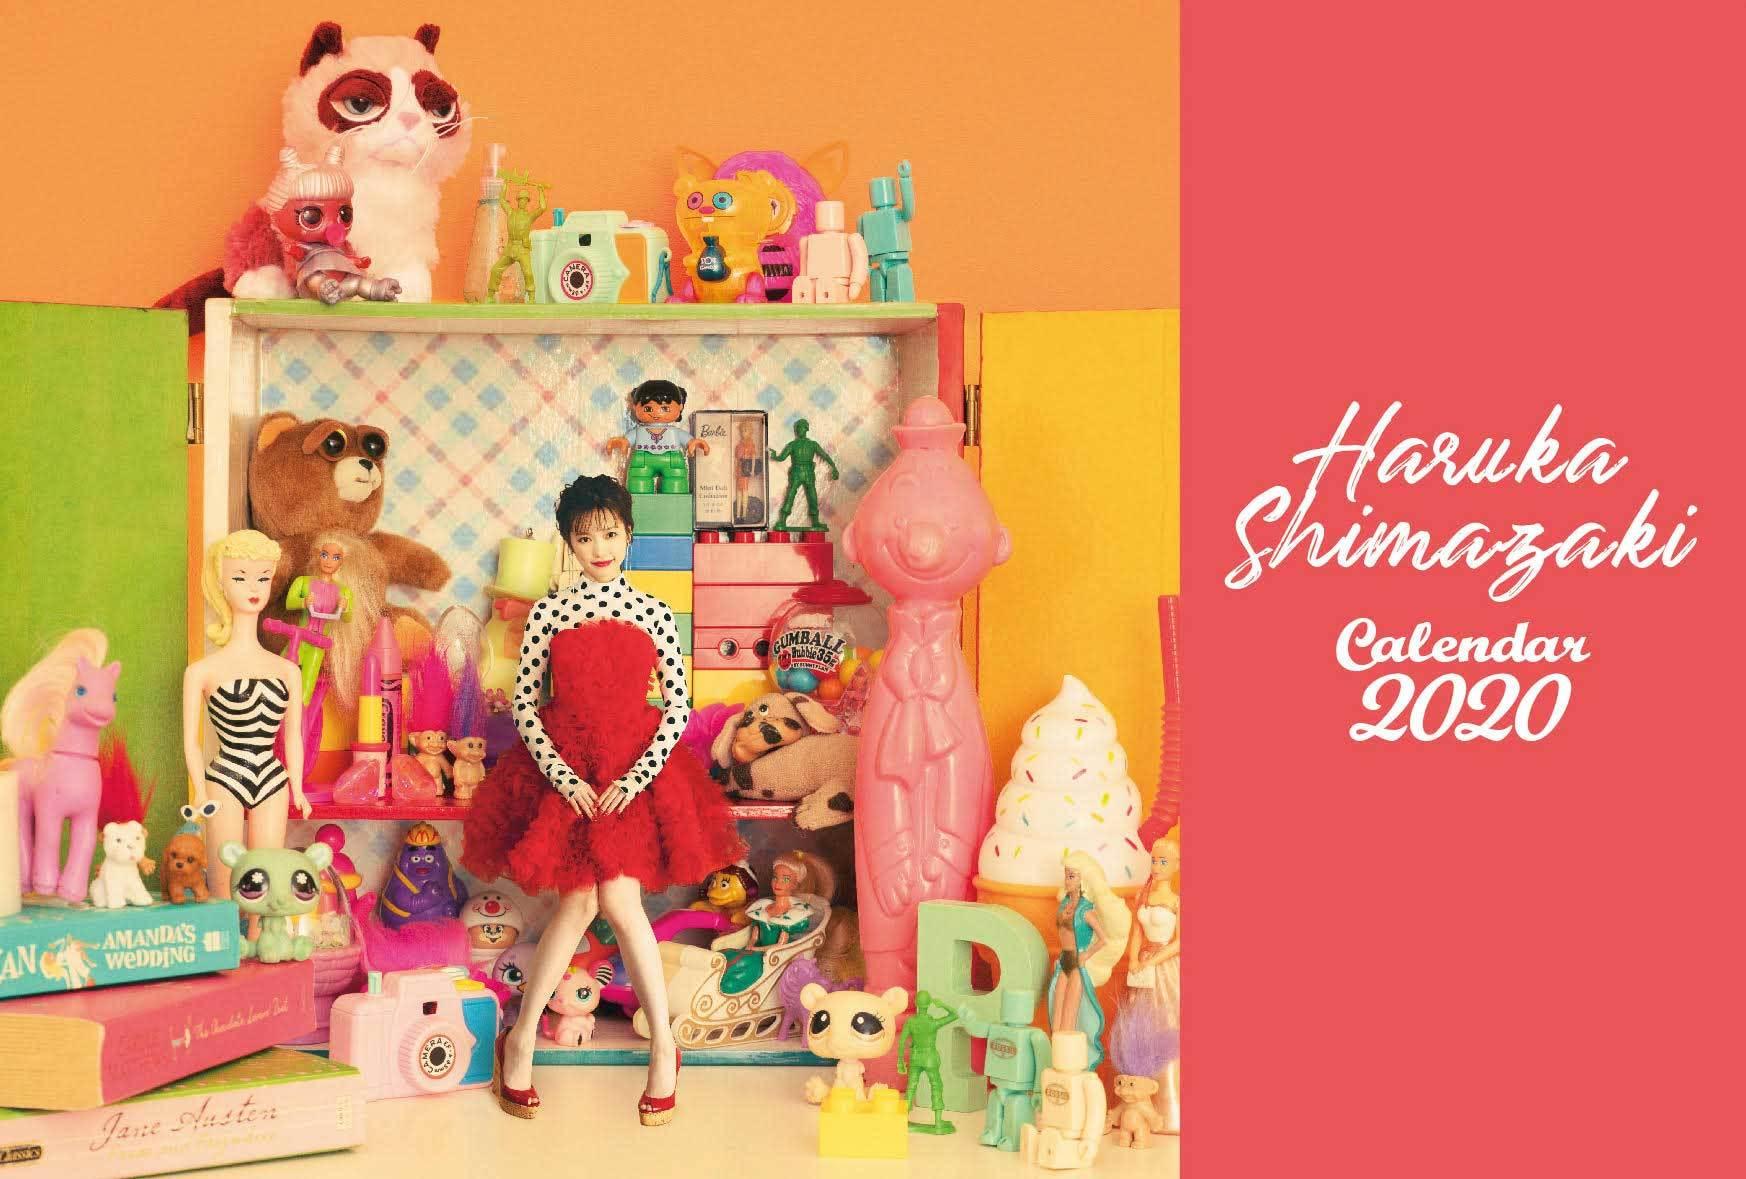 『HarukaShimazakiCalendar2020』壁掛け&卓上セット(W購入特典付き)